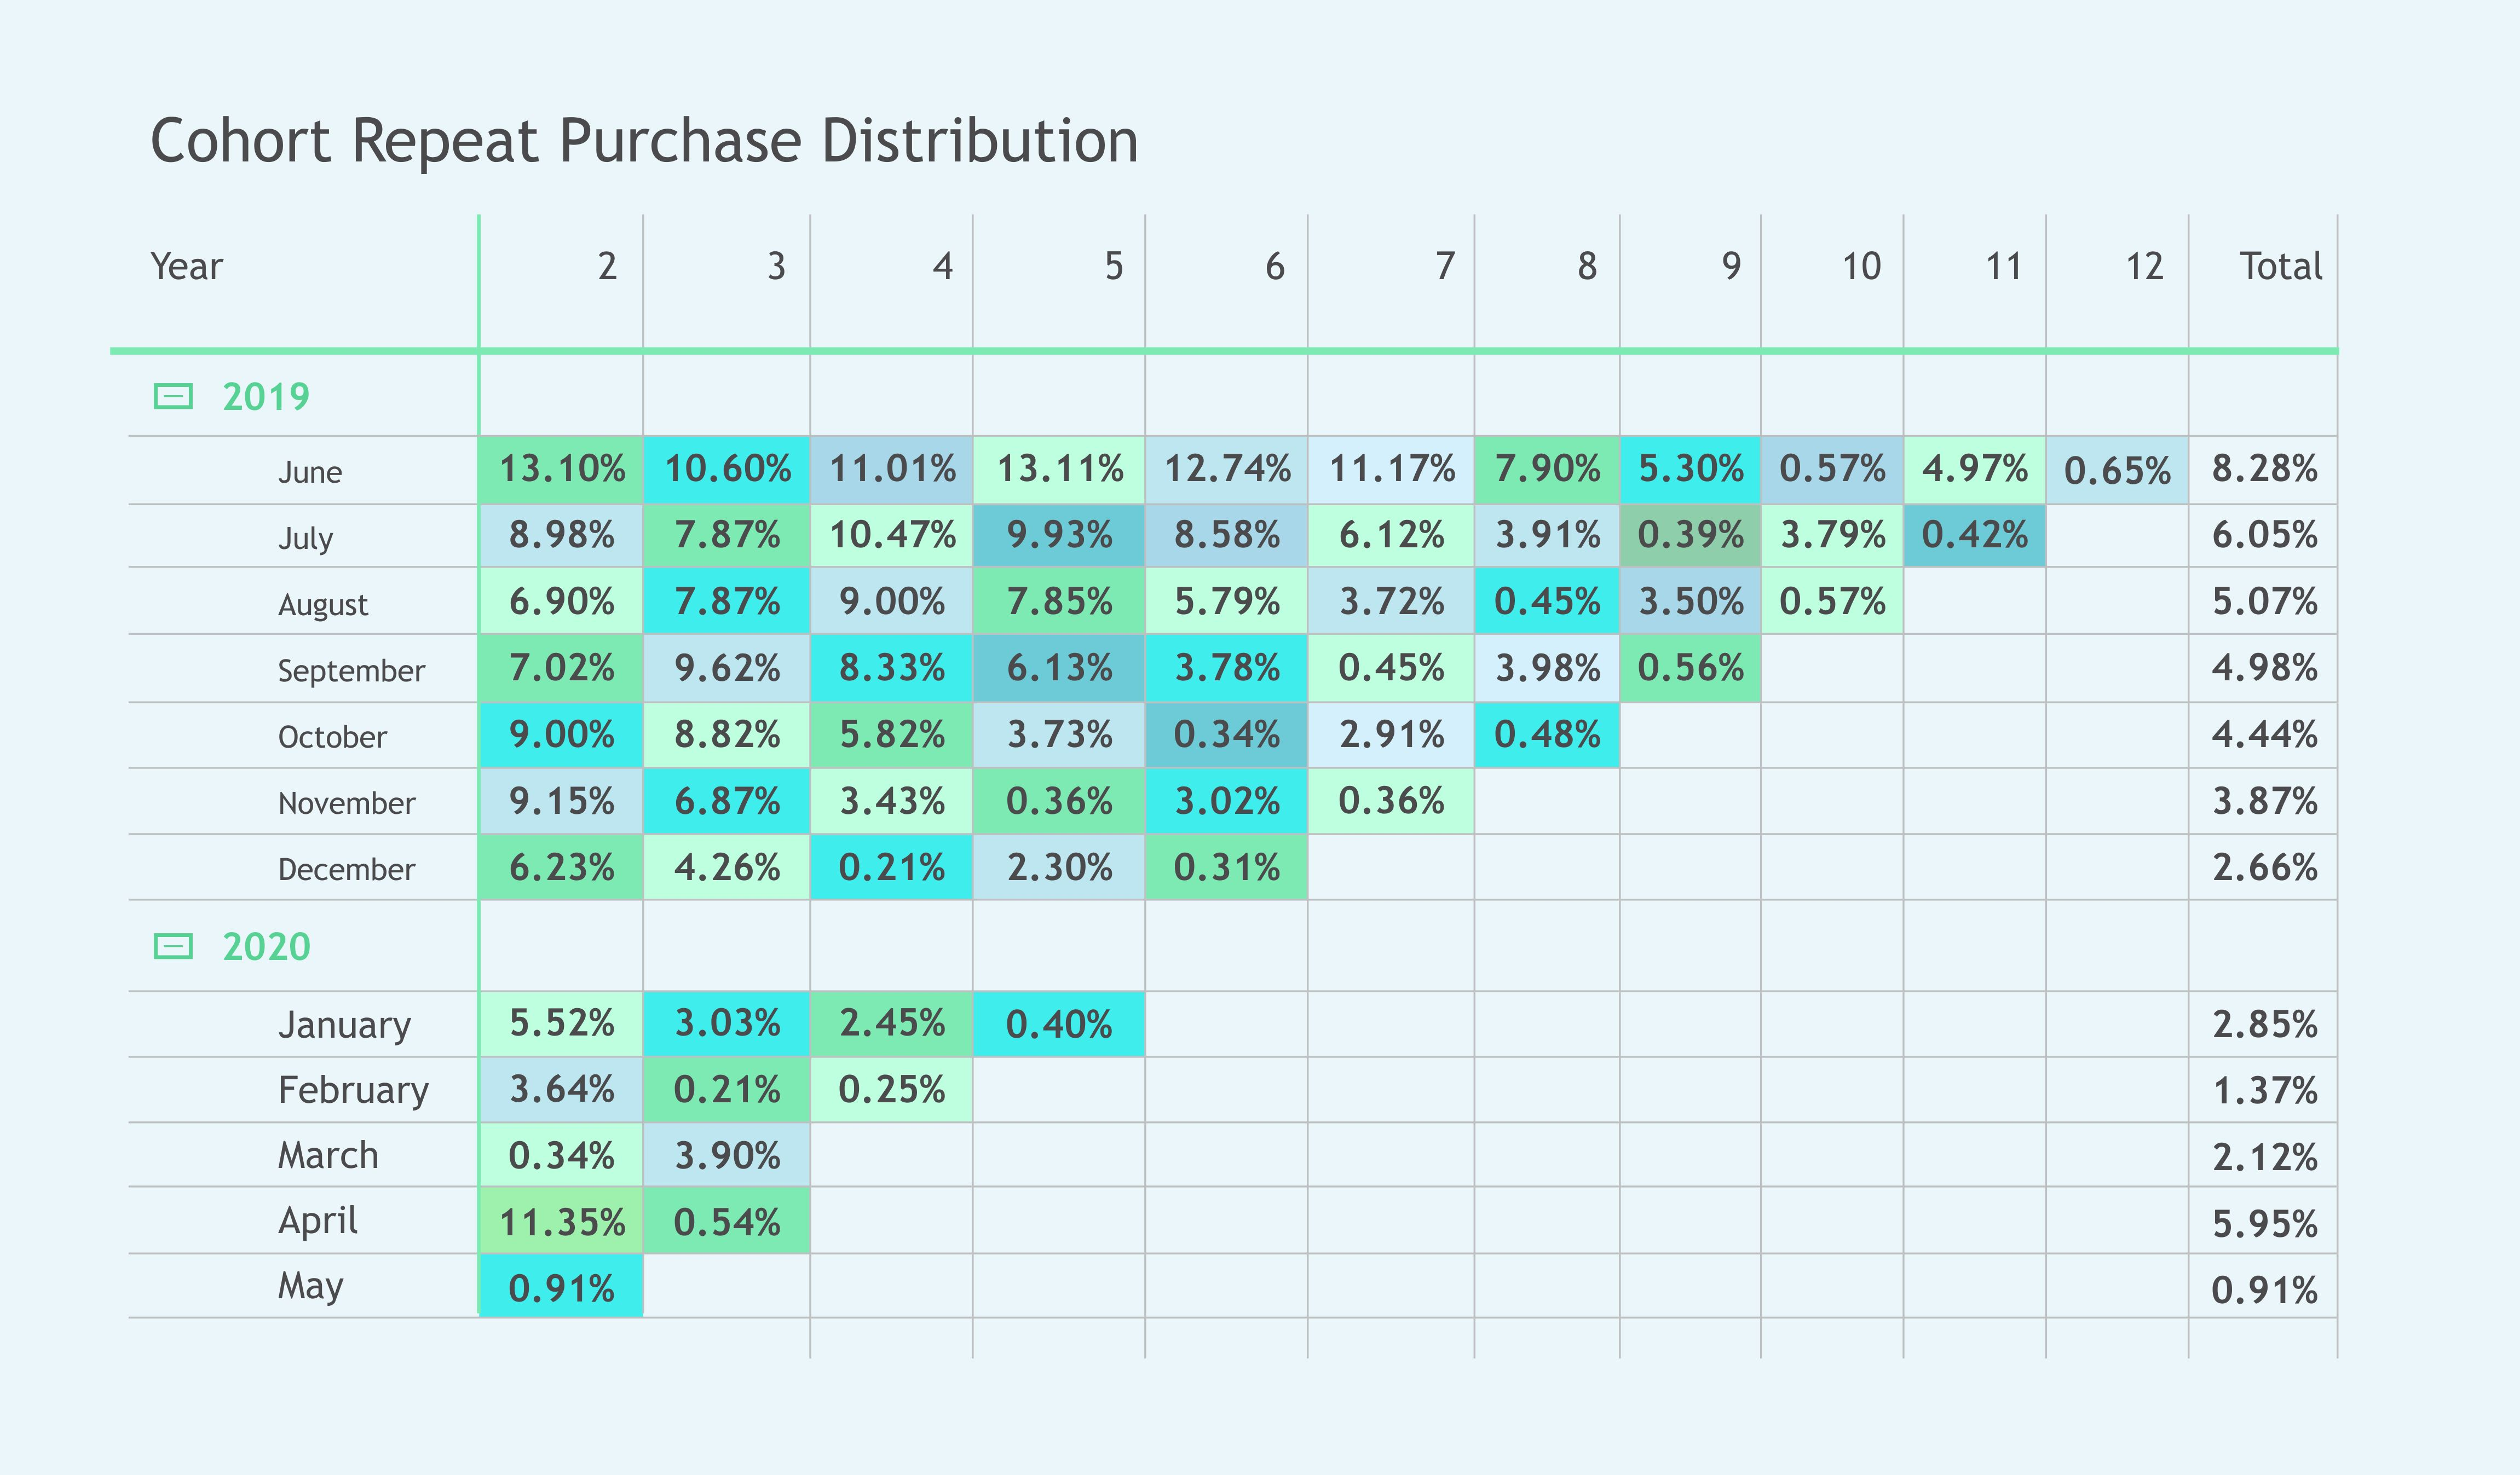 Repeat purchase usin cohort distriution